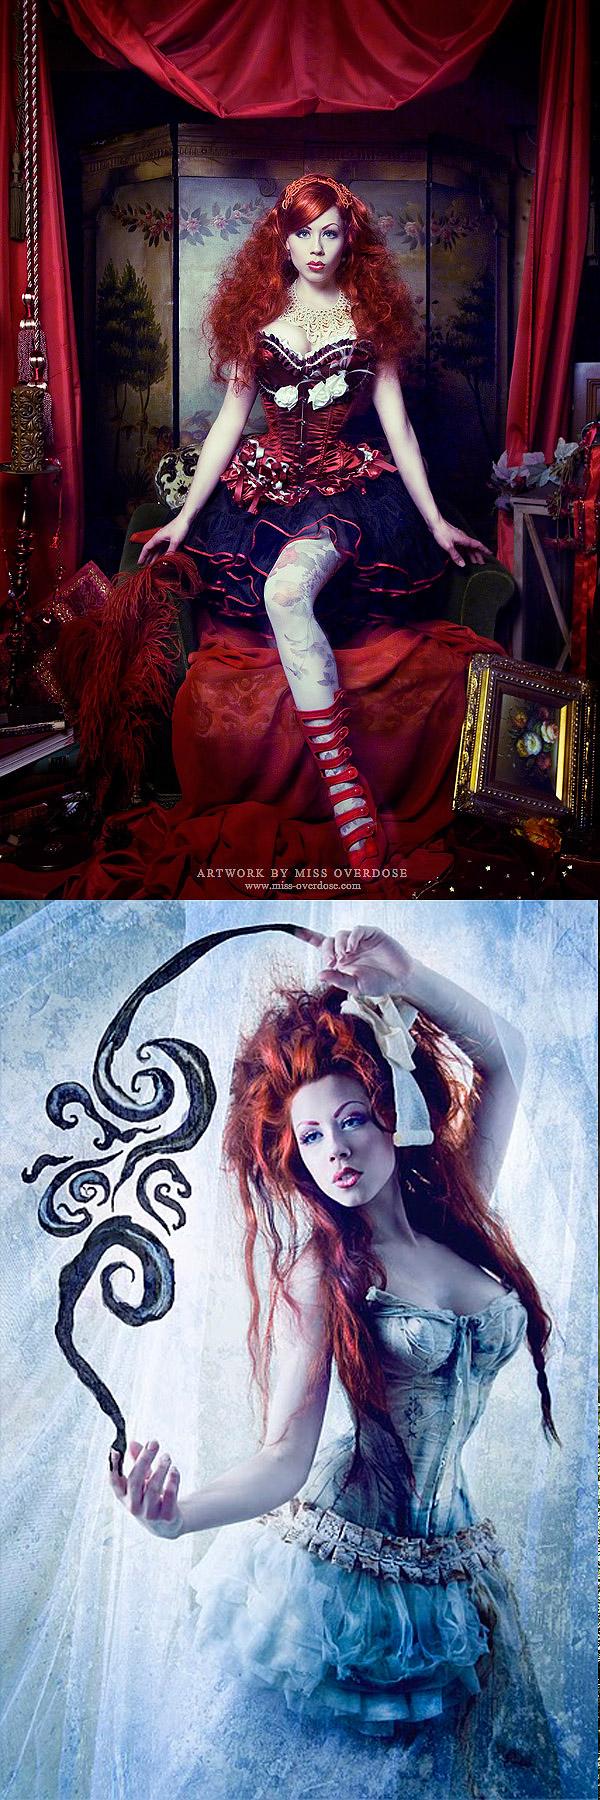 Jun 30, 2011 Mascha Zhuk Model, make up artistry, hairstyling, wardrobe design: Ophelia Overdose